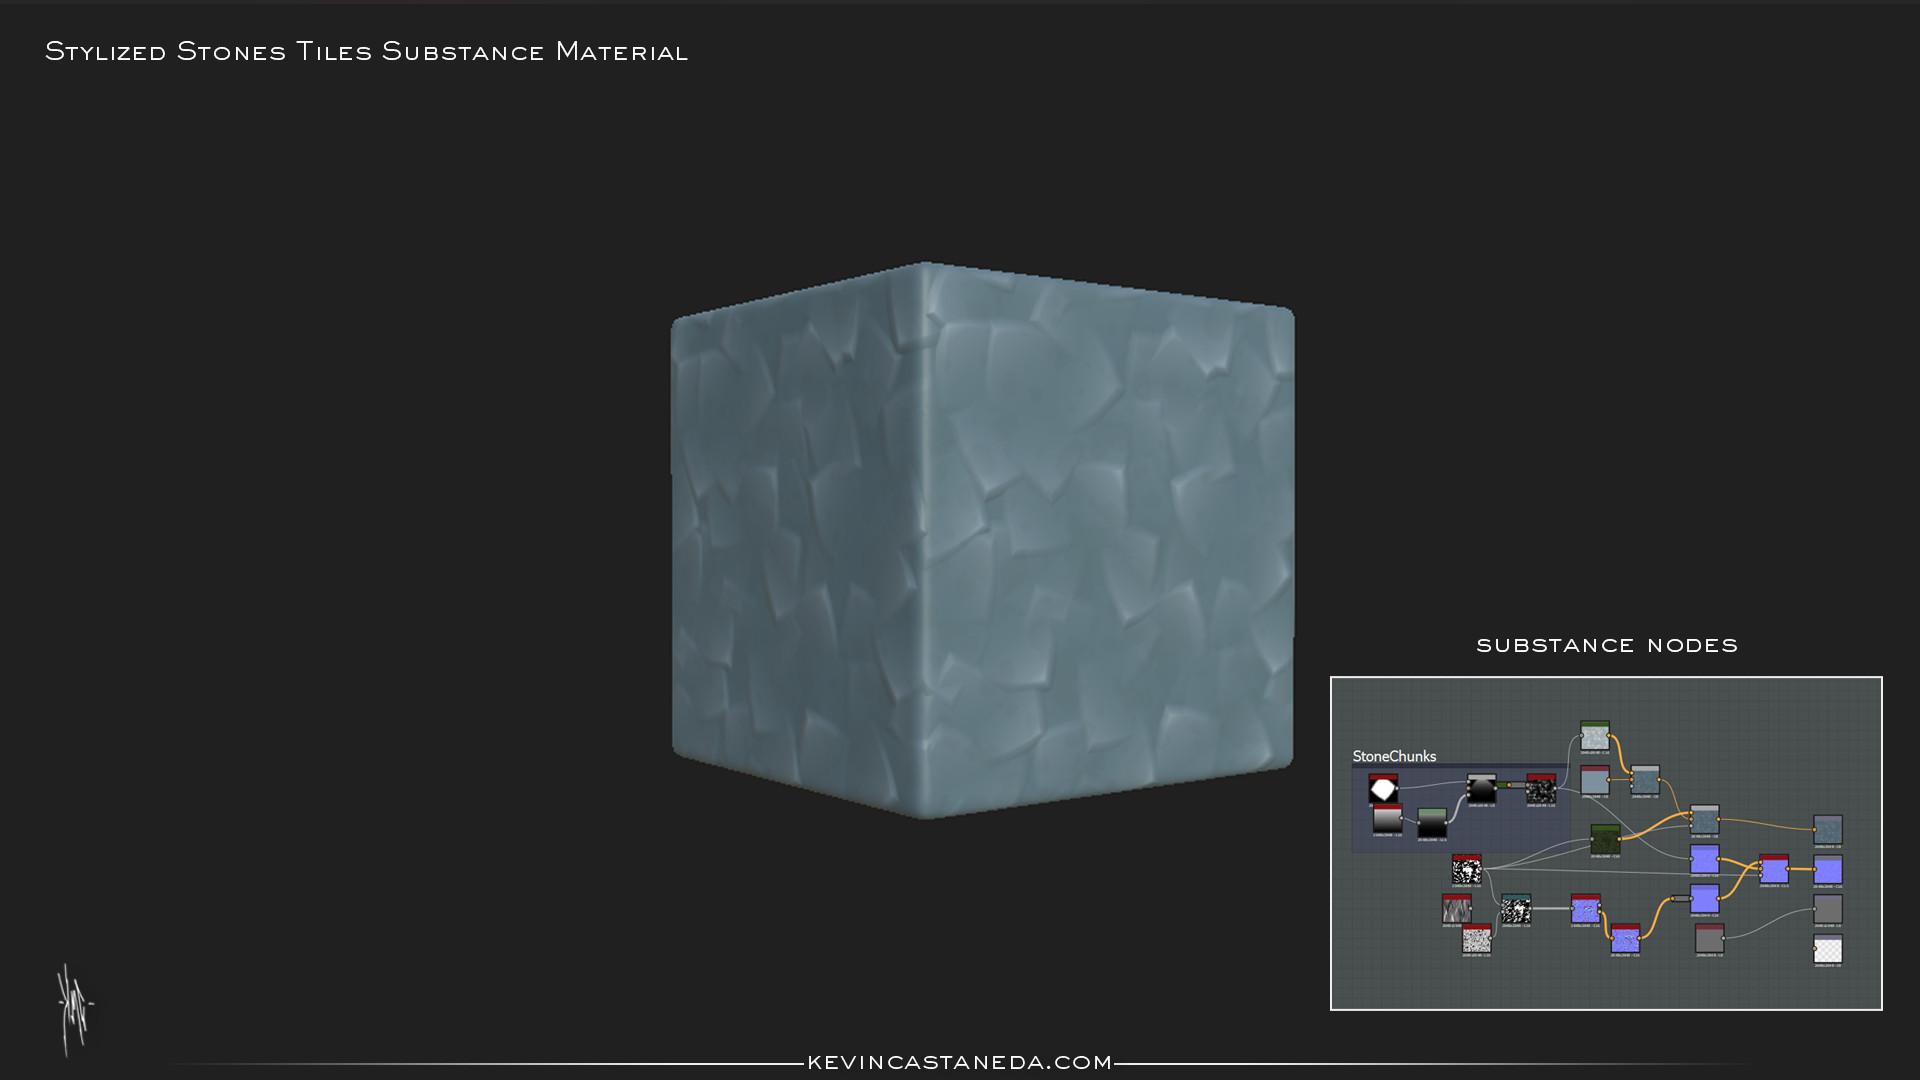 Kevin m castaneda stylized stone tiles substance